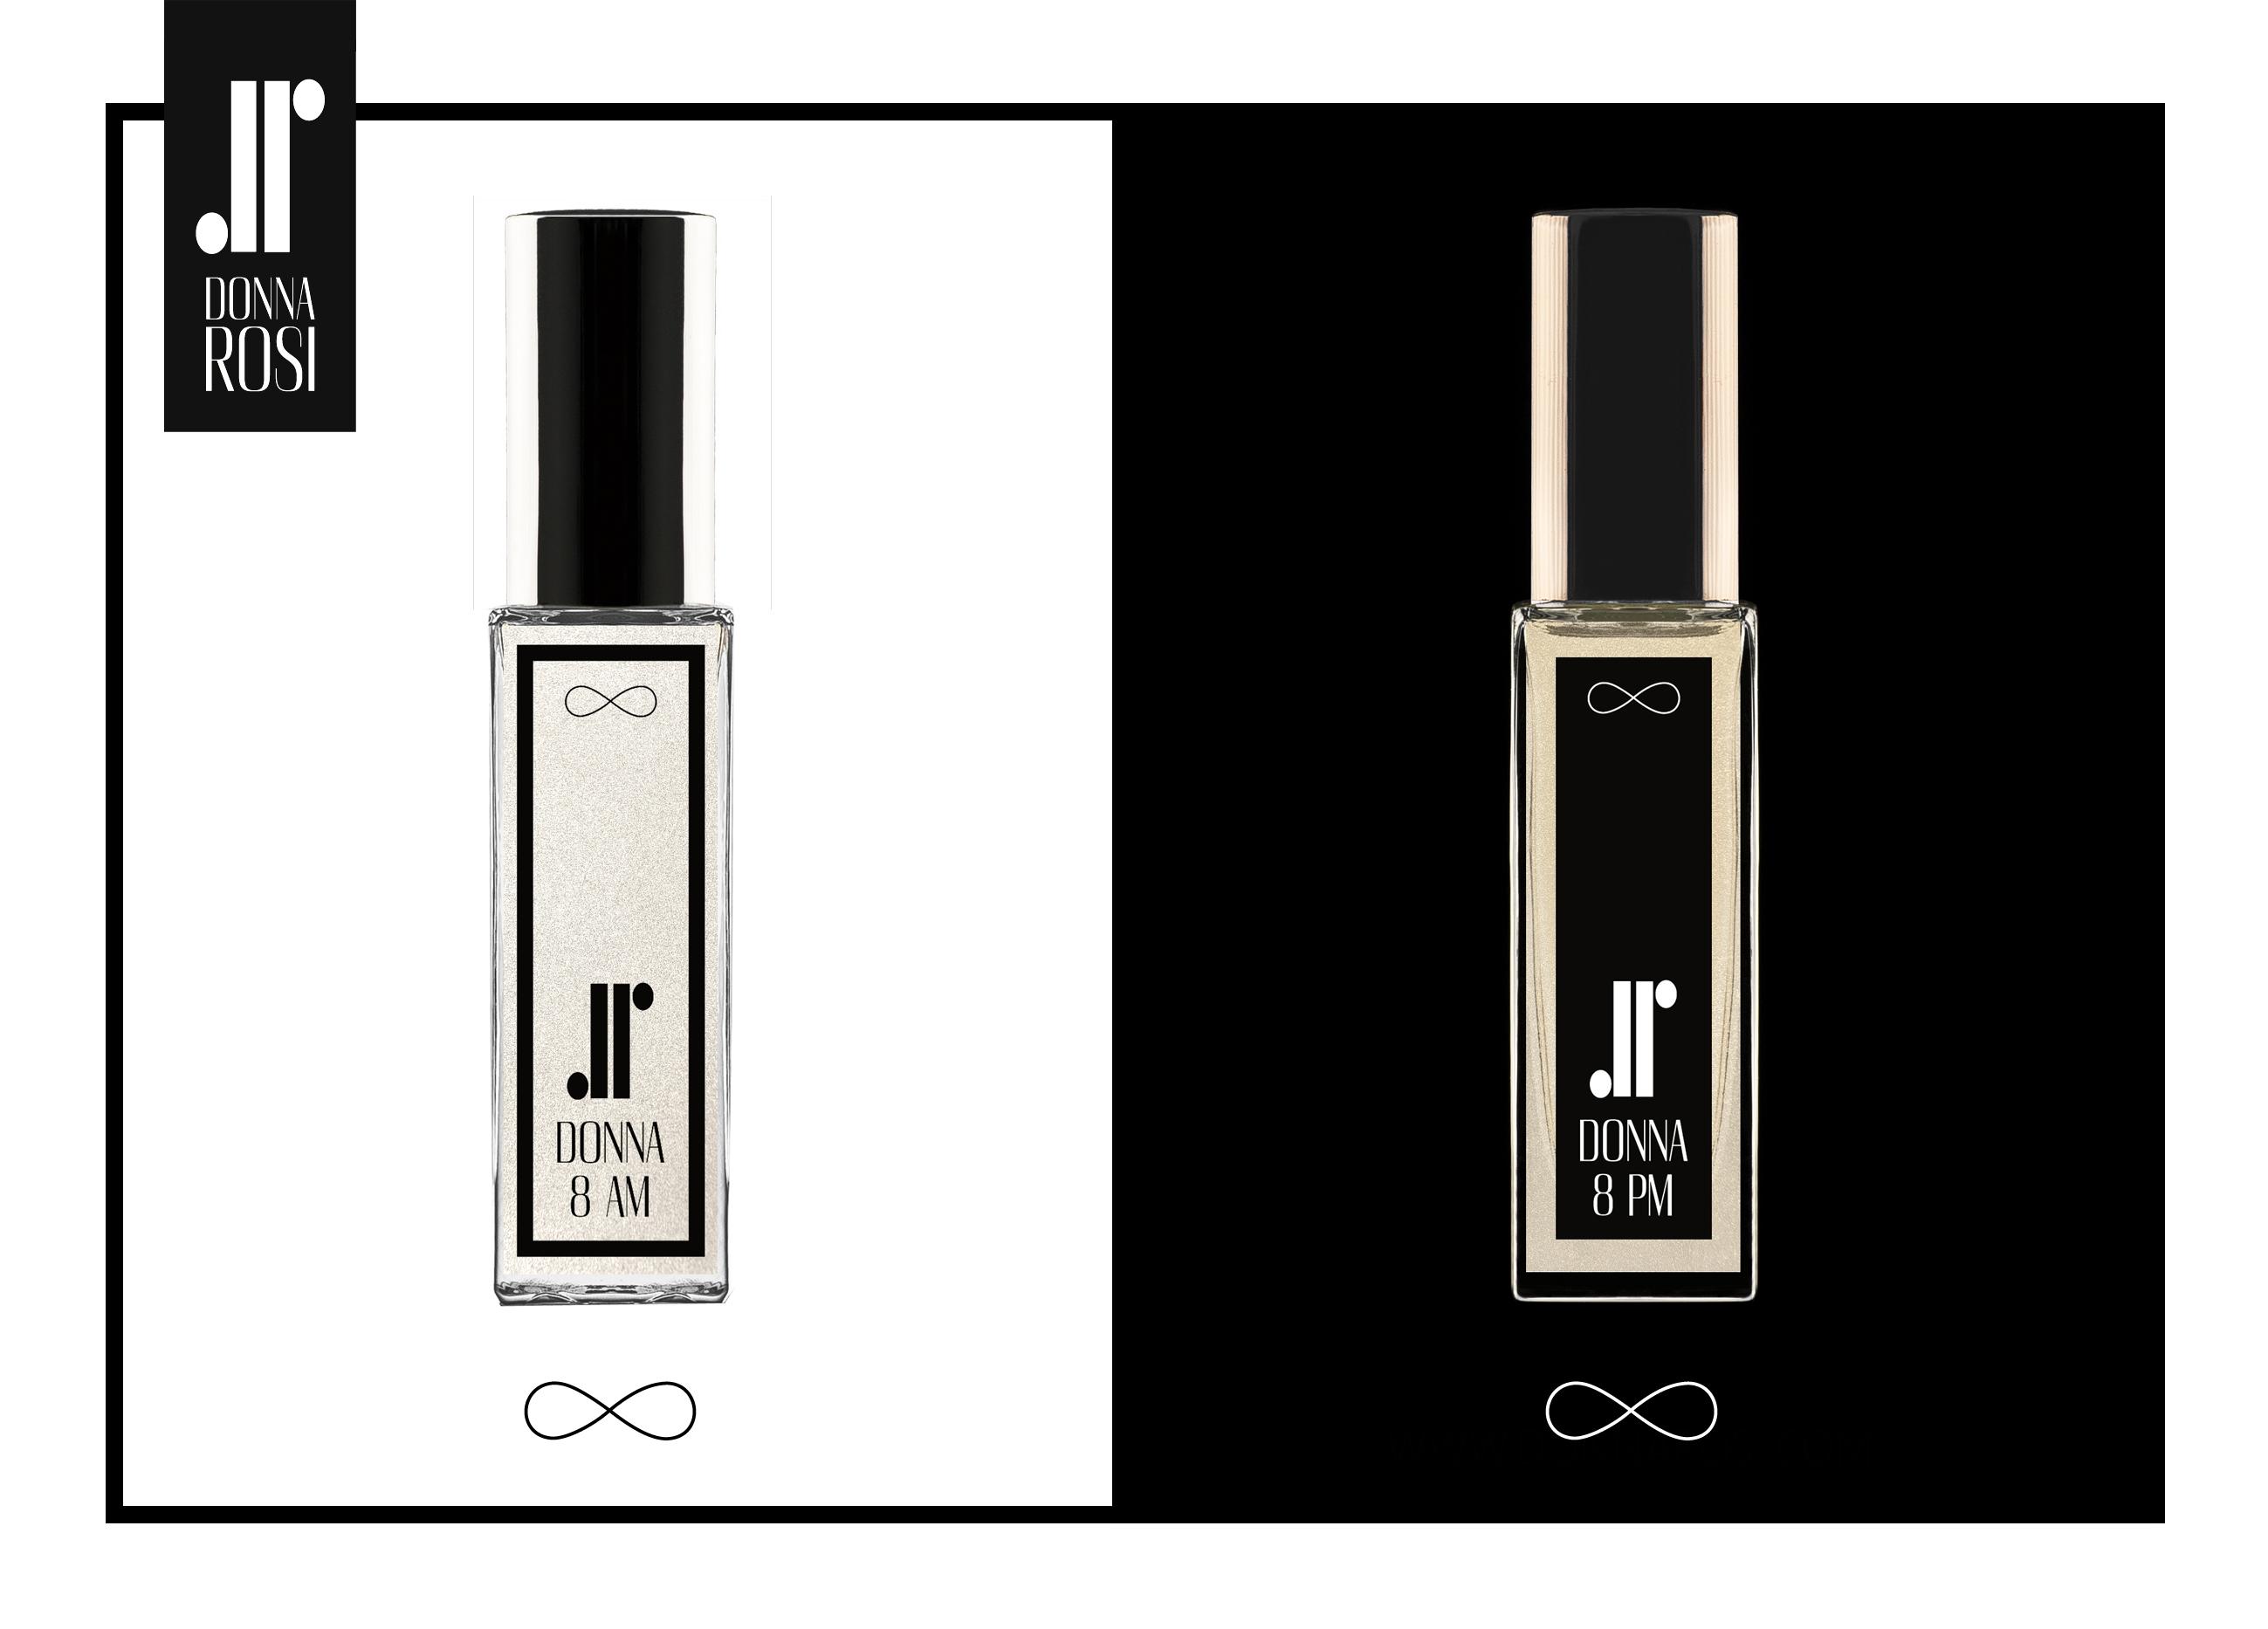 Parfum - DONNA 8 A.M.